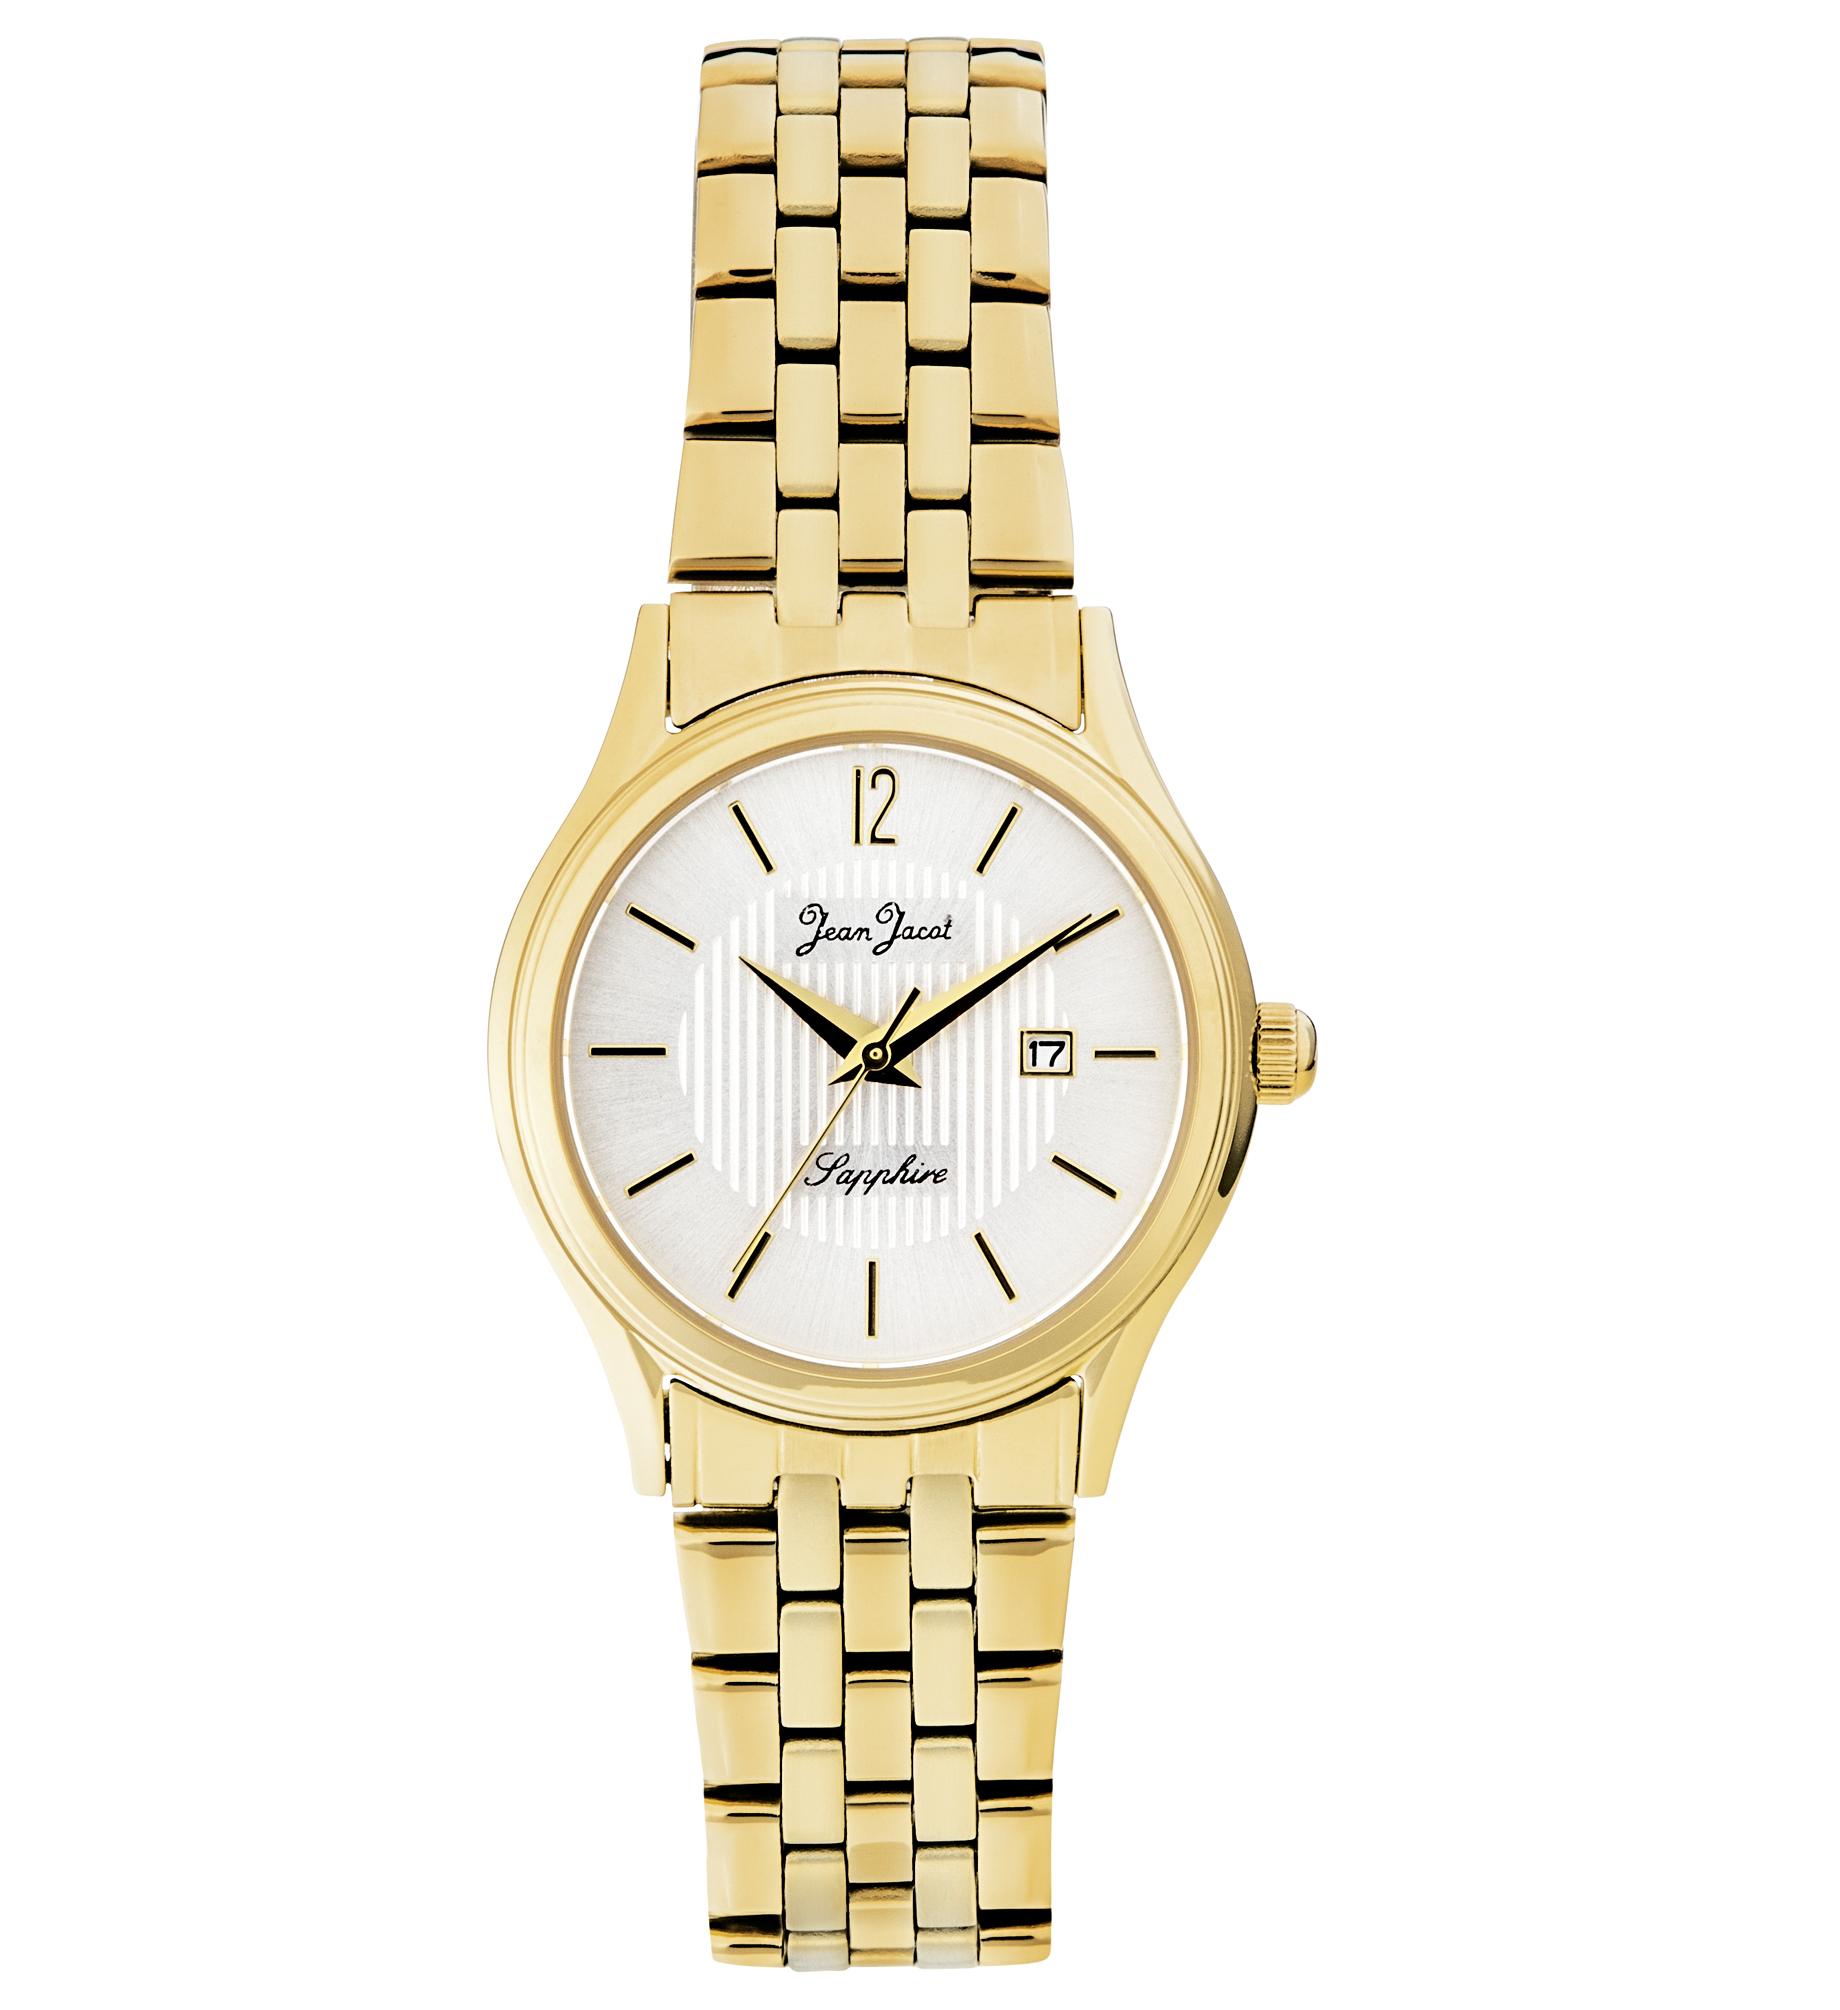 Jean Jacot Damen-Armbanduhr